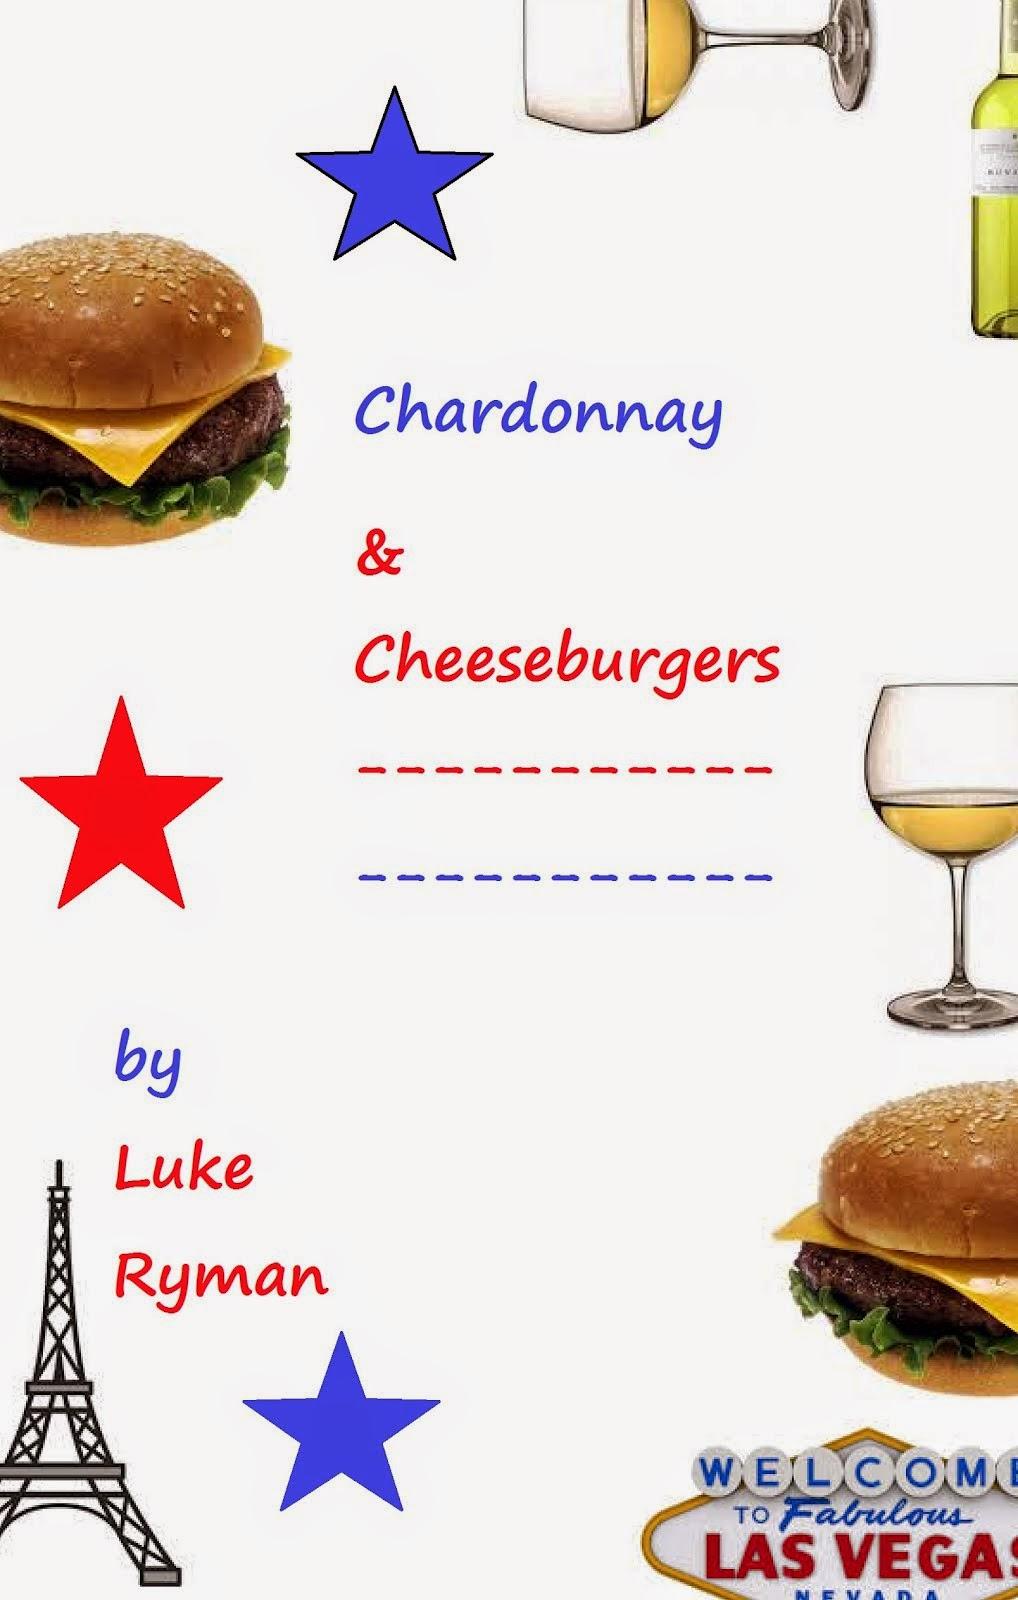 Chardonnay & Cheeseburgers